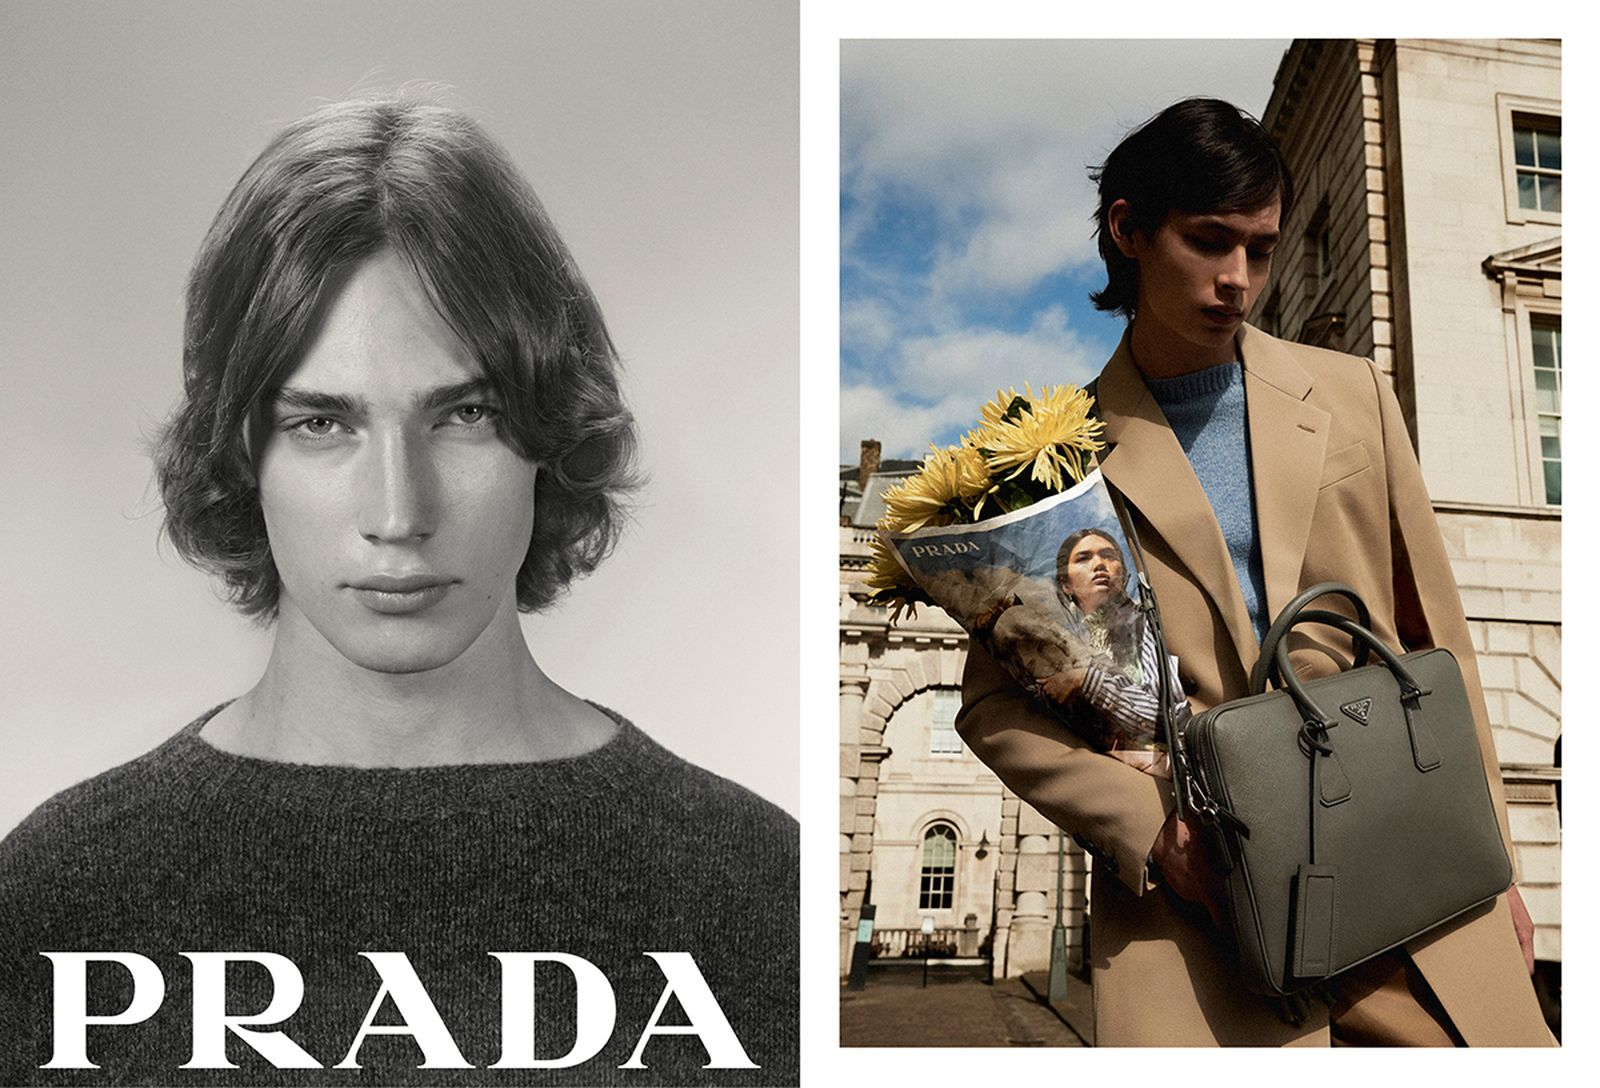 Prada Resort 2020 campaign